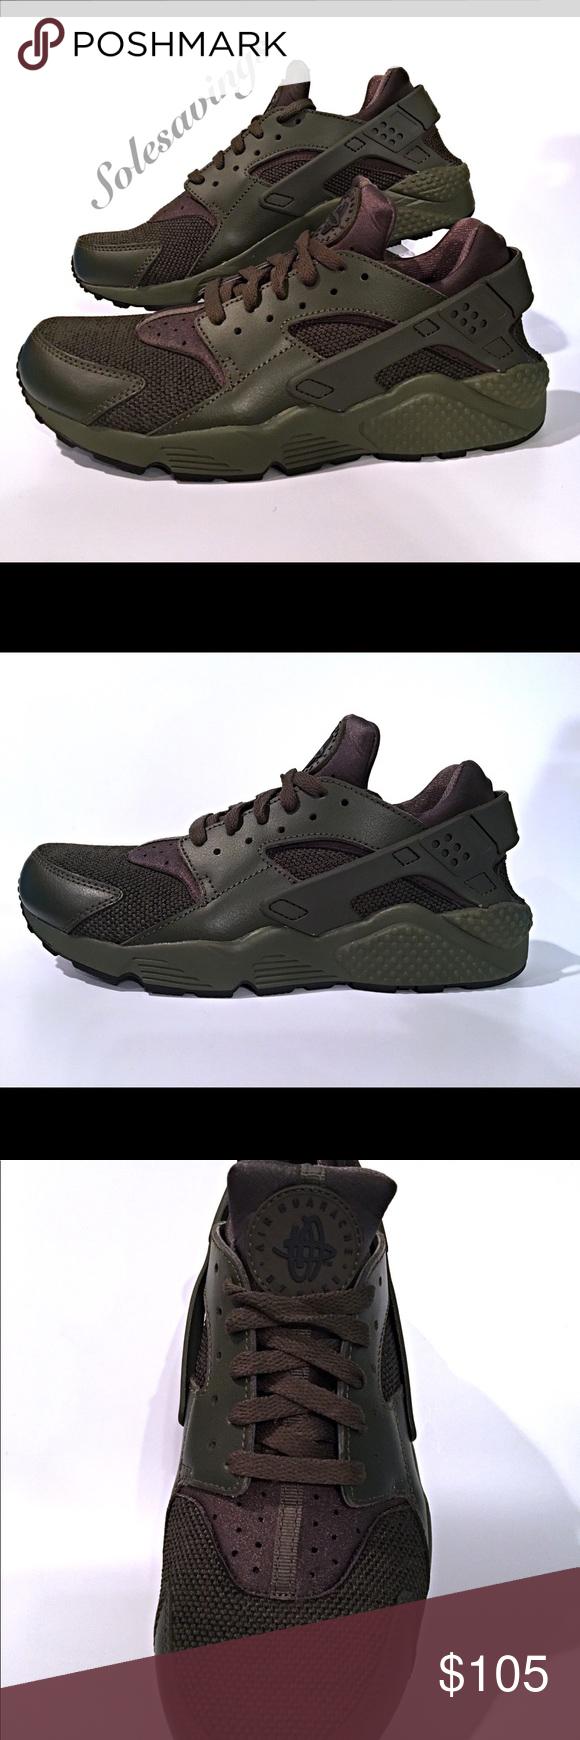 outlet store b4fd0 b8146 Men s Nike Air Huarache Cargo Khaki New W Box Nike Air Huarache Color  Cargo  Khacki Black New with Original Box Men s All Sizes Retail   110.00 Nike  Shoes ...